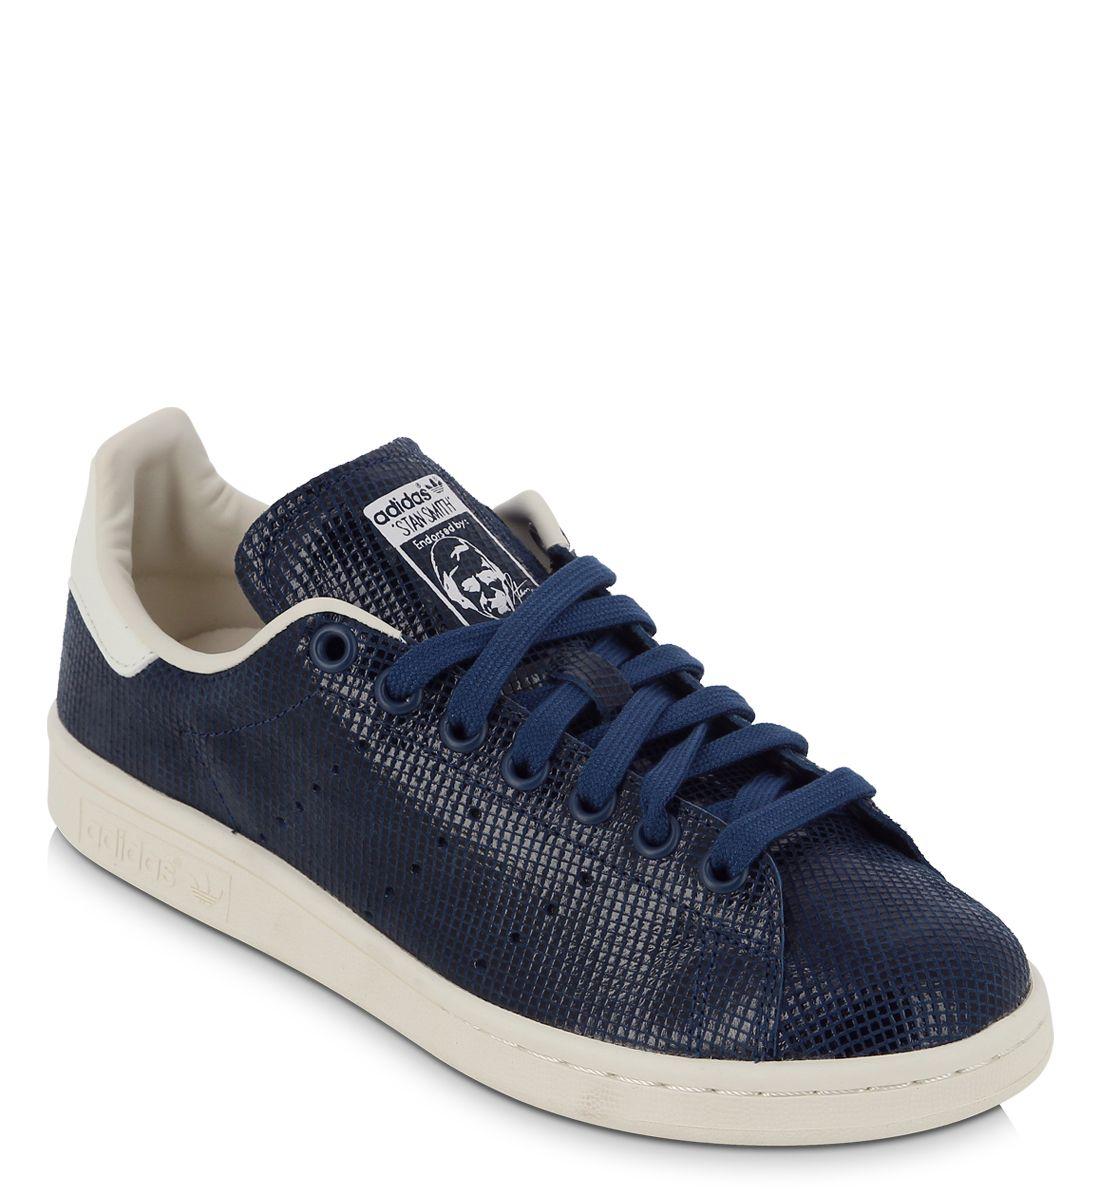 adidas femme bleu marine